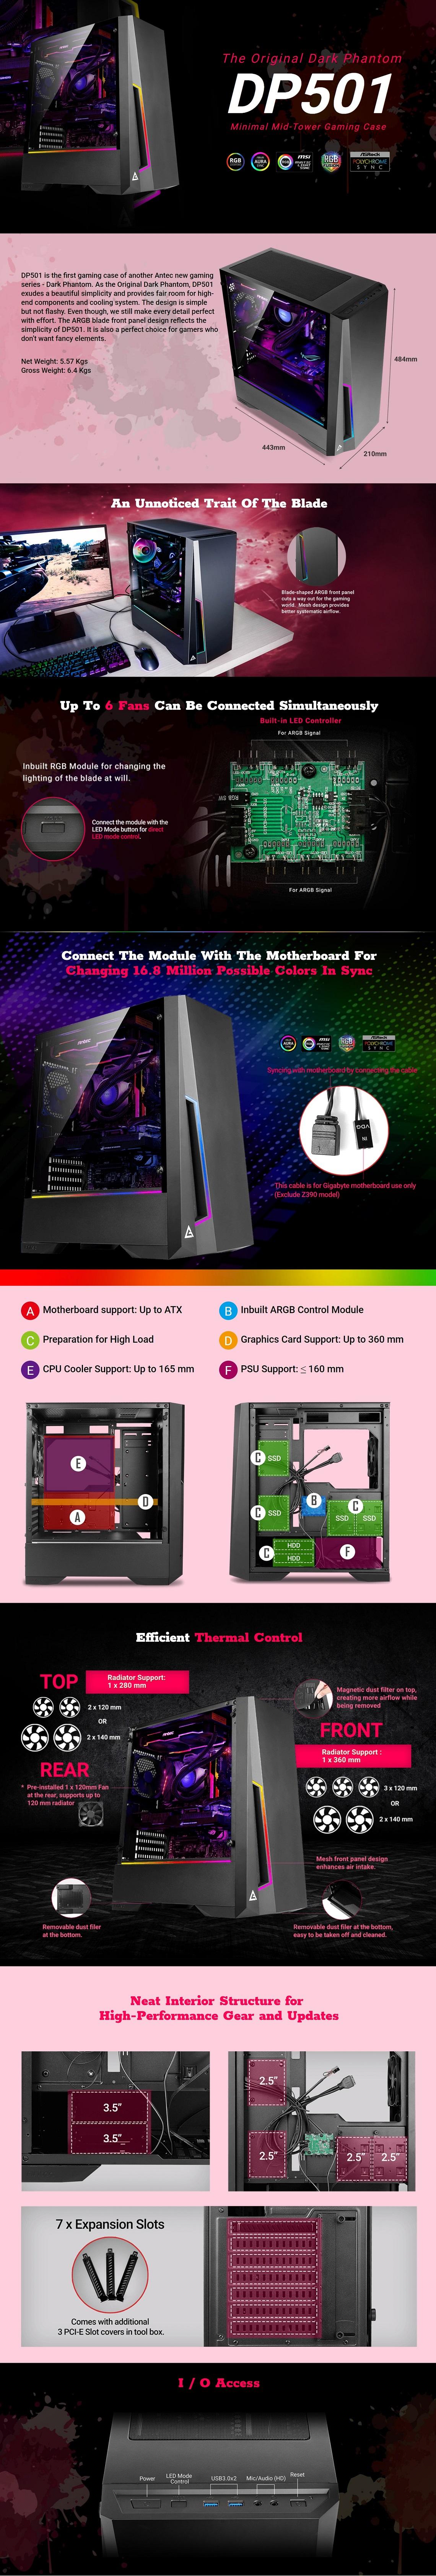 Antec DP501 Dark Phantom ATX ARGB Front LED Control Tempered Glass Gaming Case